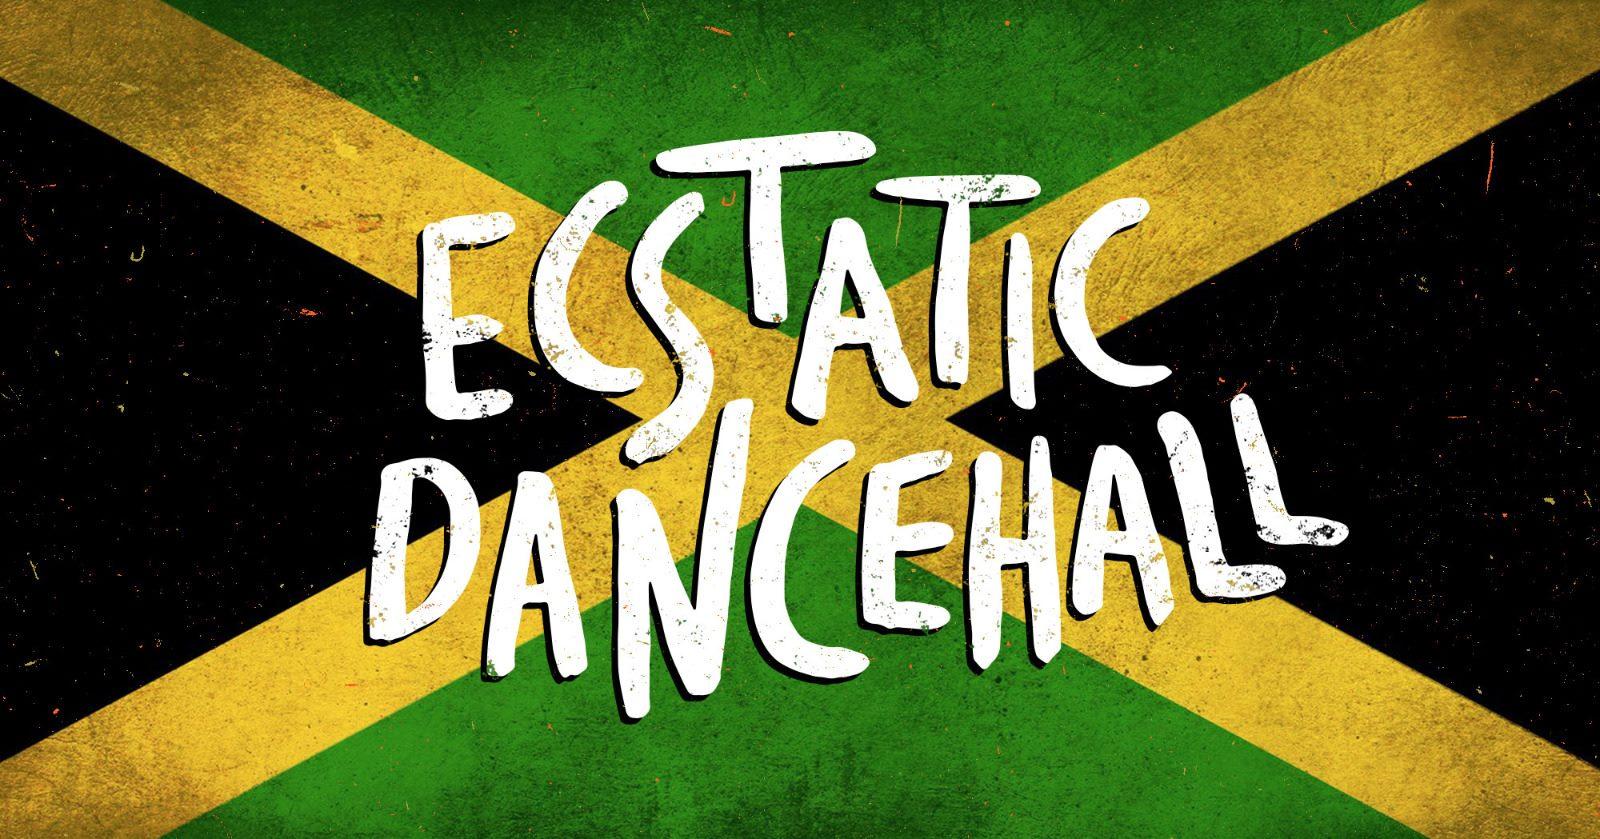 ecstatic dancehall